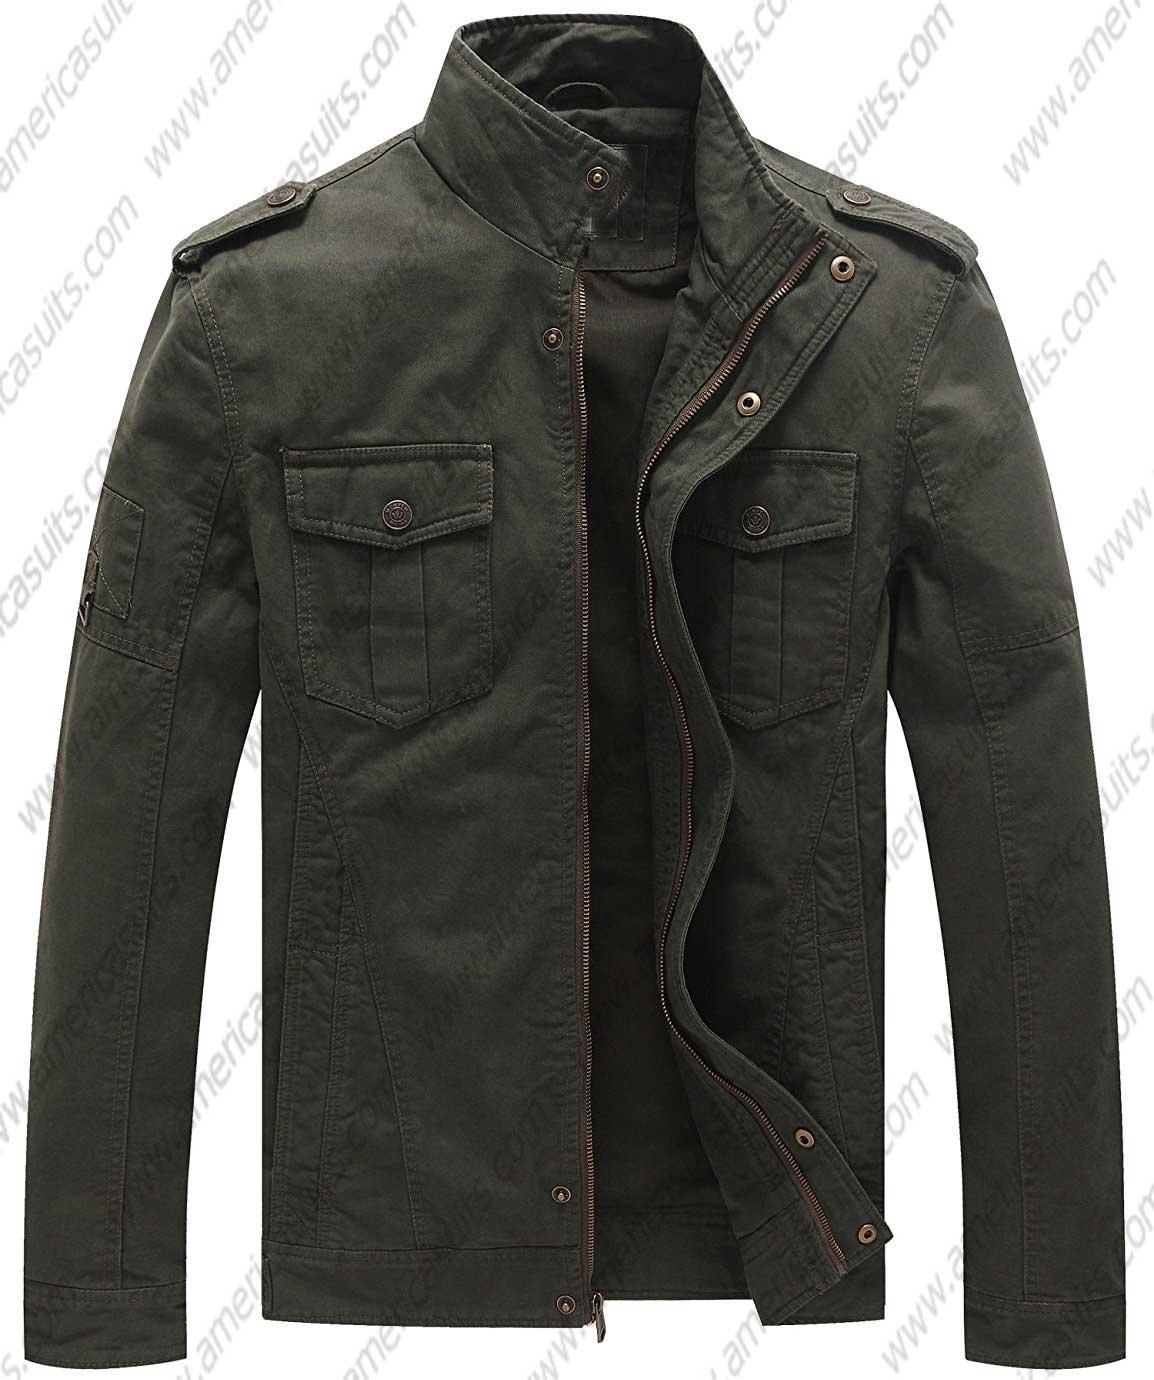 men-fashion-military-jacket1